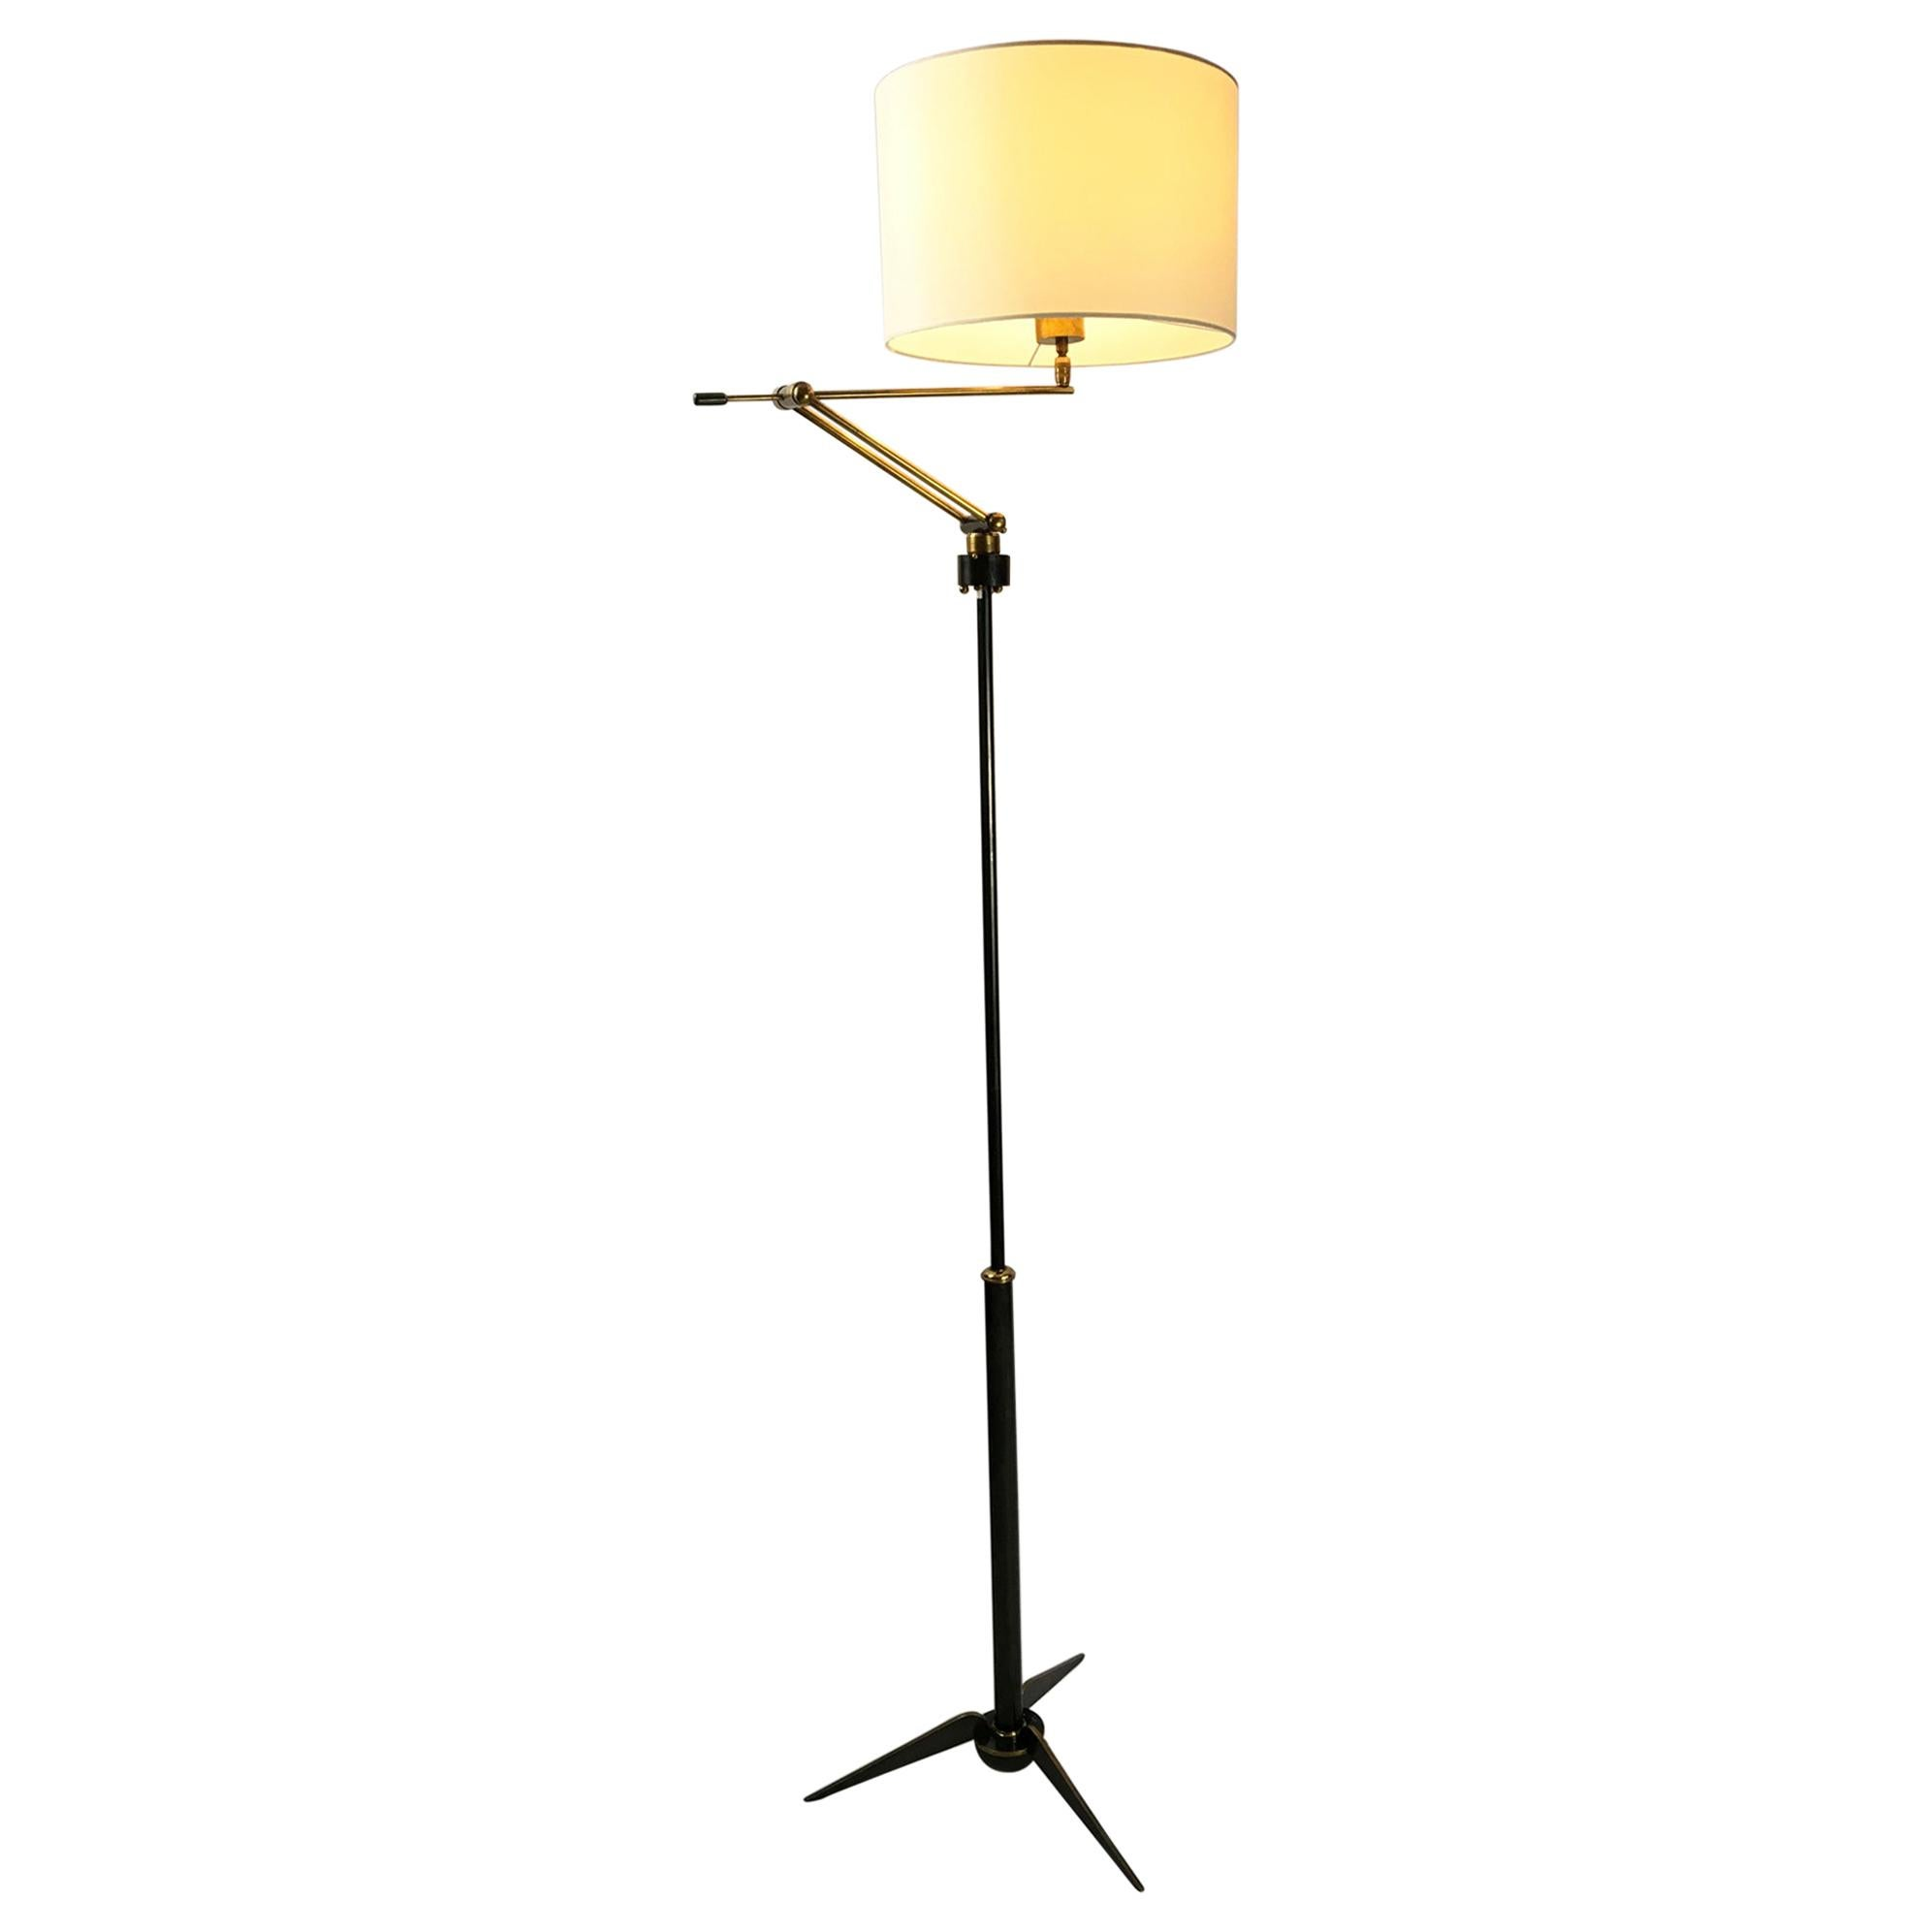 1950s Floor Lamp by Maison Lunel, France